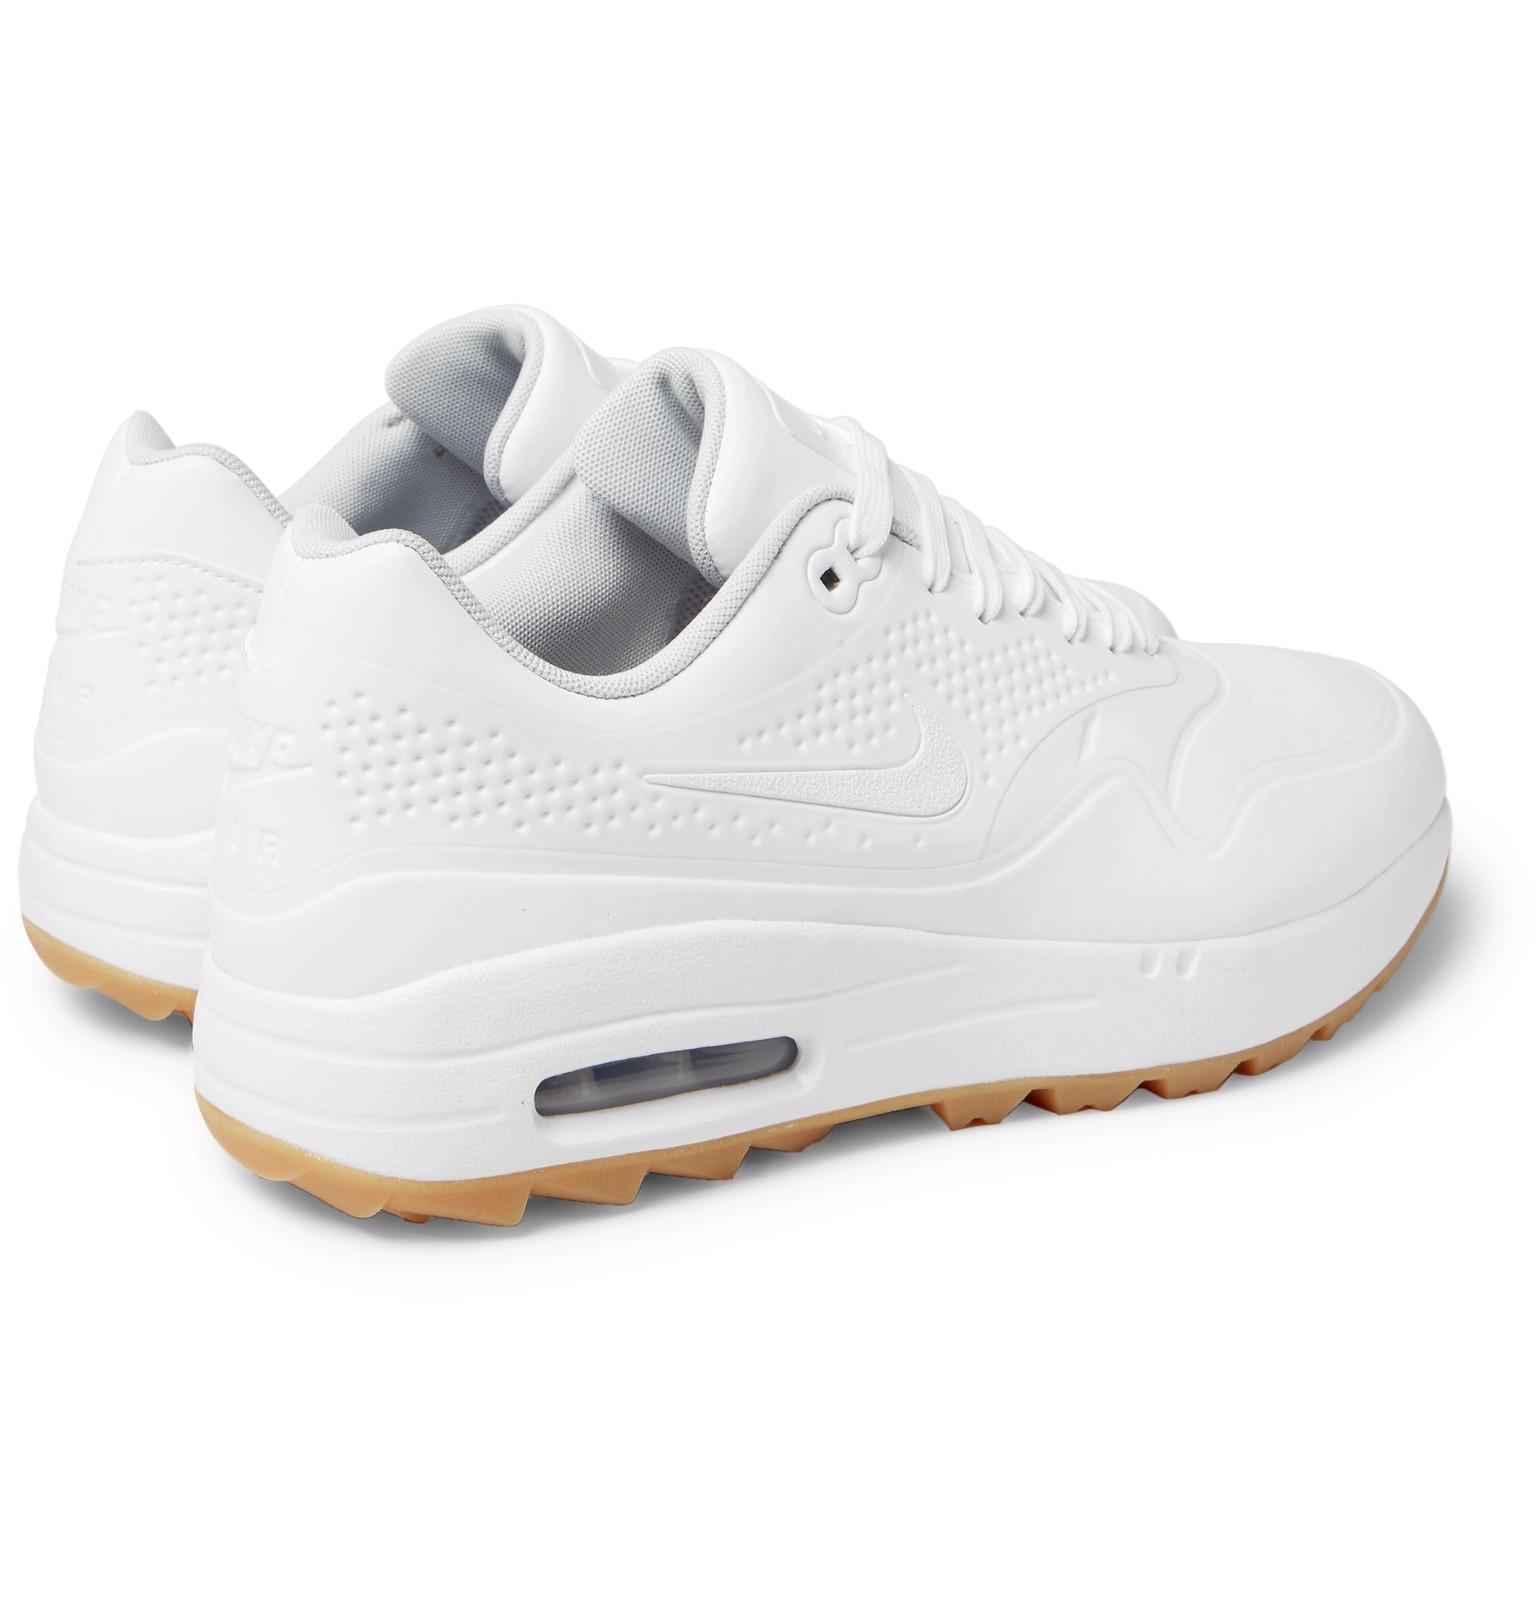 buy popular 92f55 e570a Nike GolfAir Max 1G Coated Mesh Golf Shoes